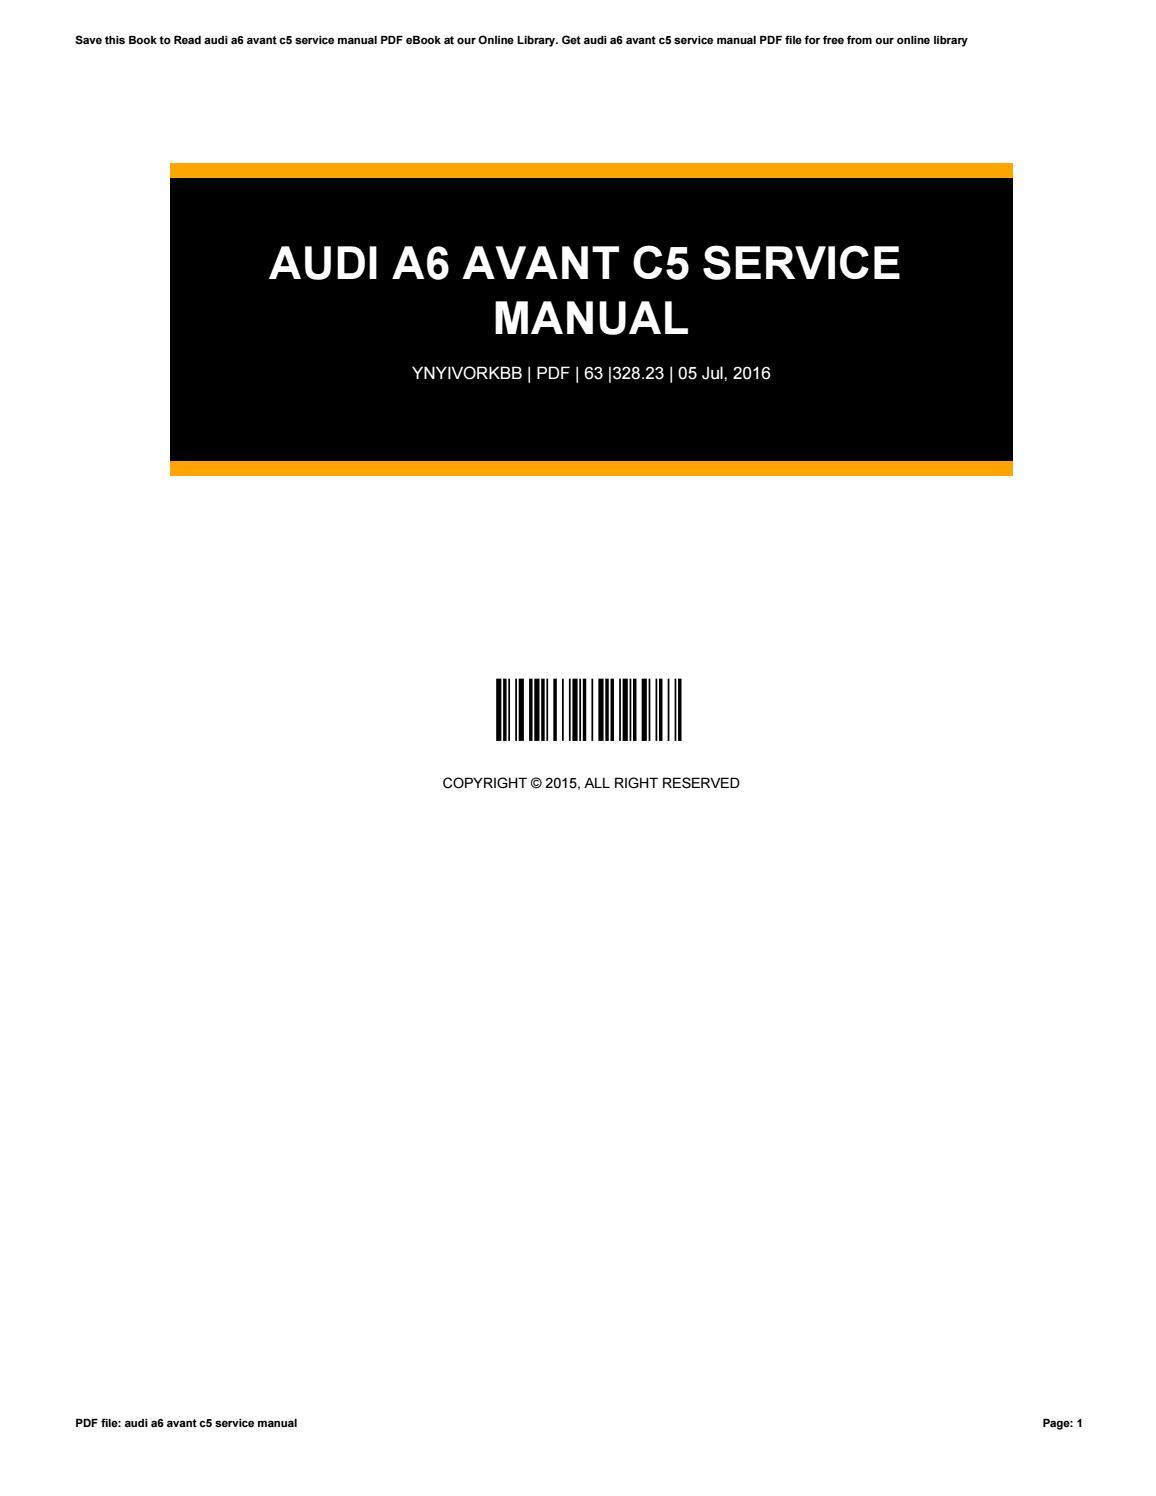 audi allroad c5 service manual